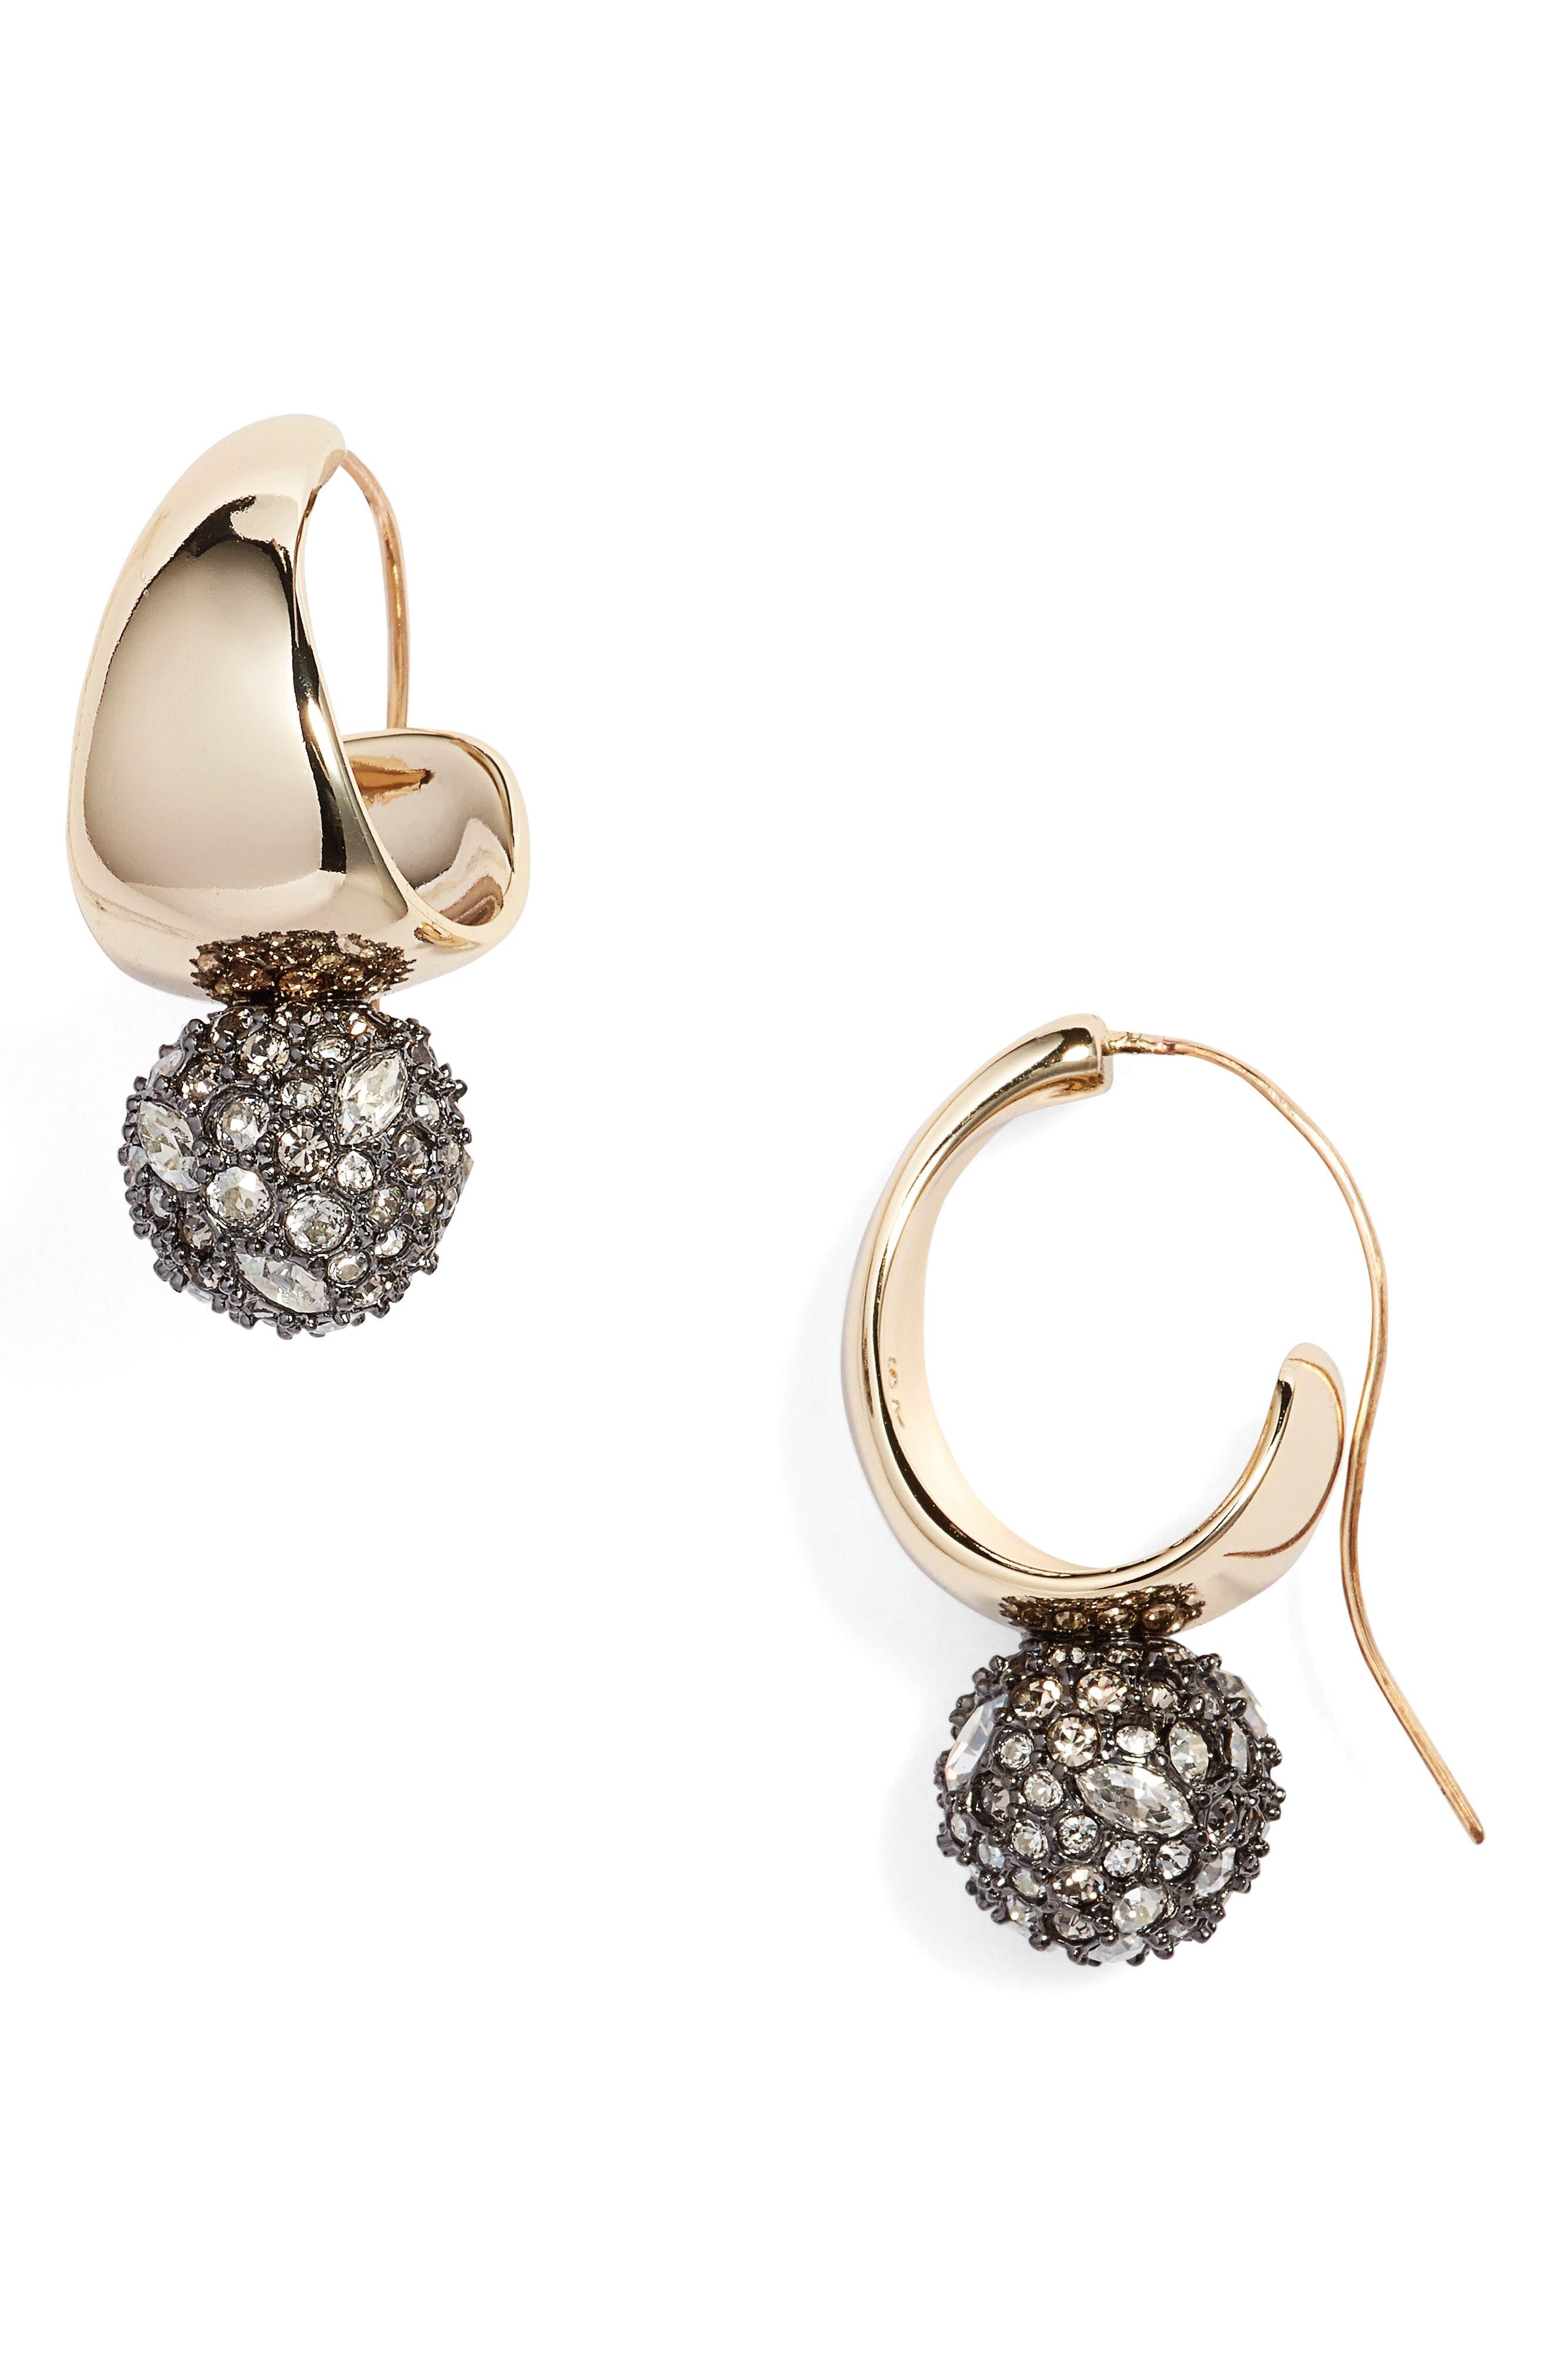 Pavé Crystal Hoop Earrings,                             Main thumbnail 1, color,                             Gold